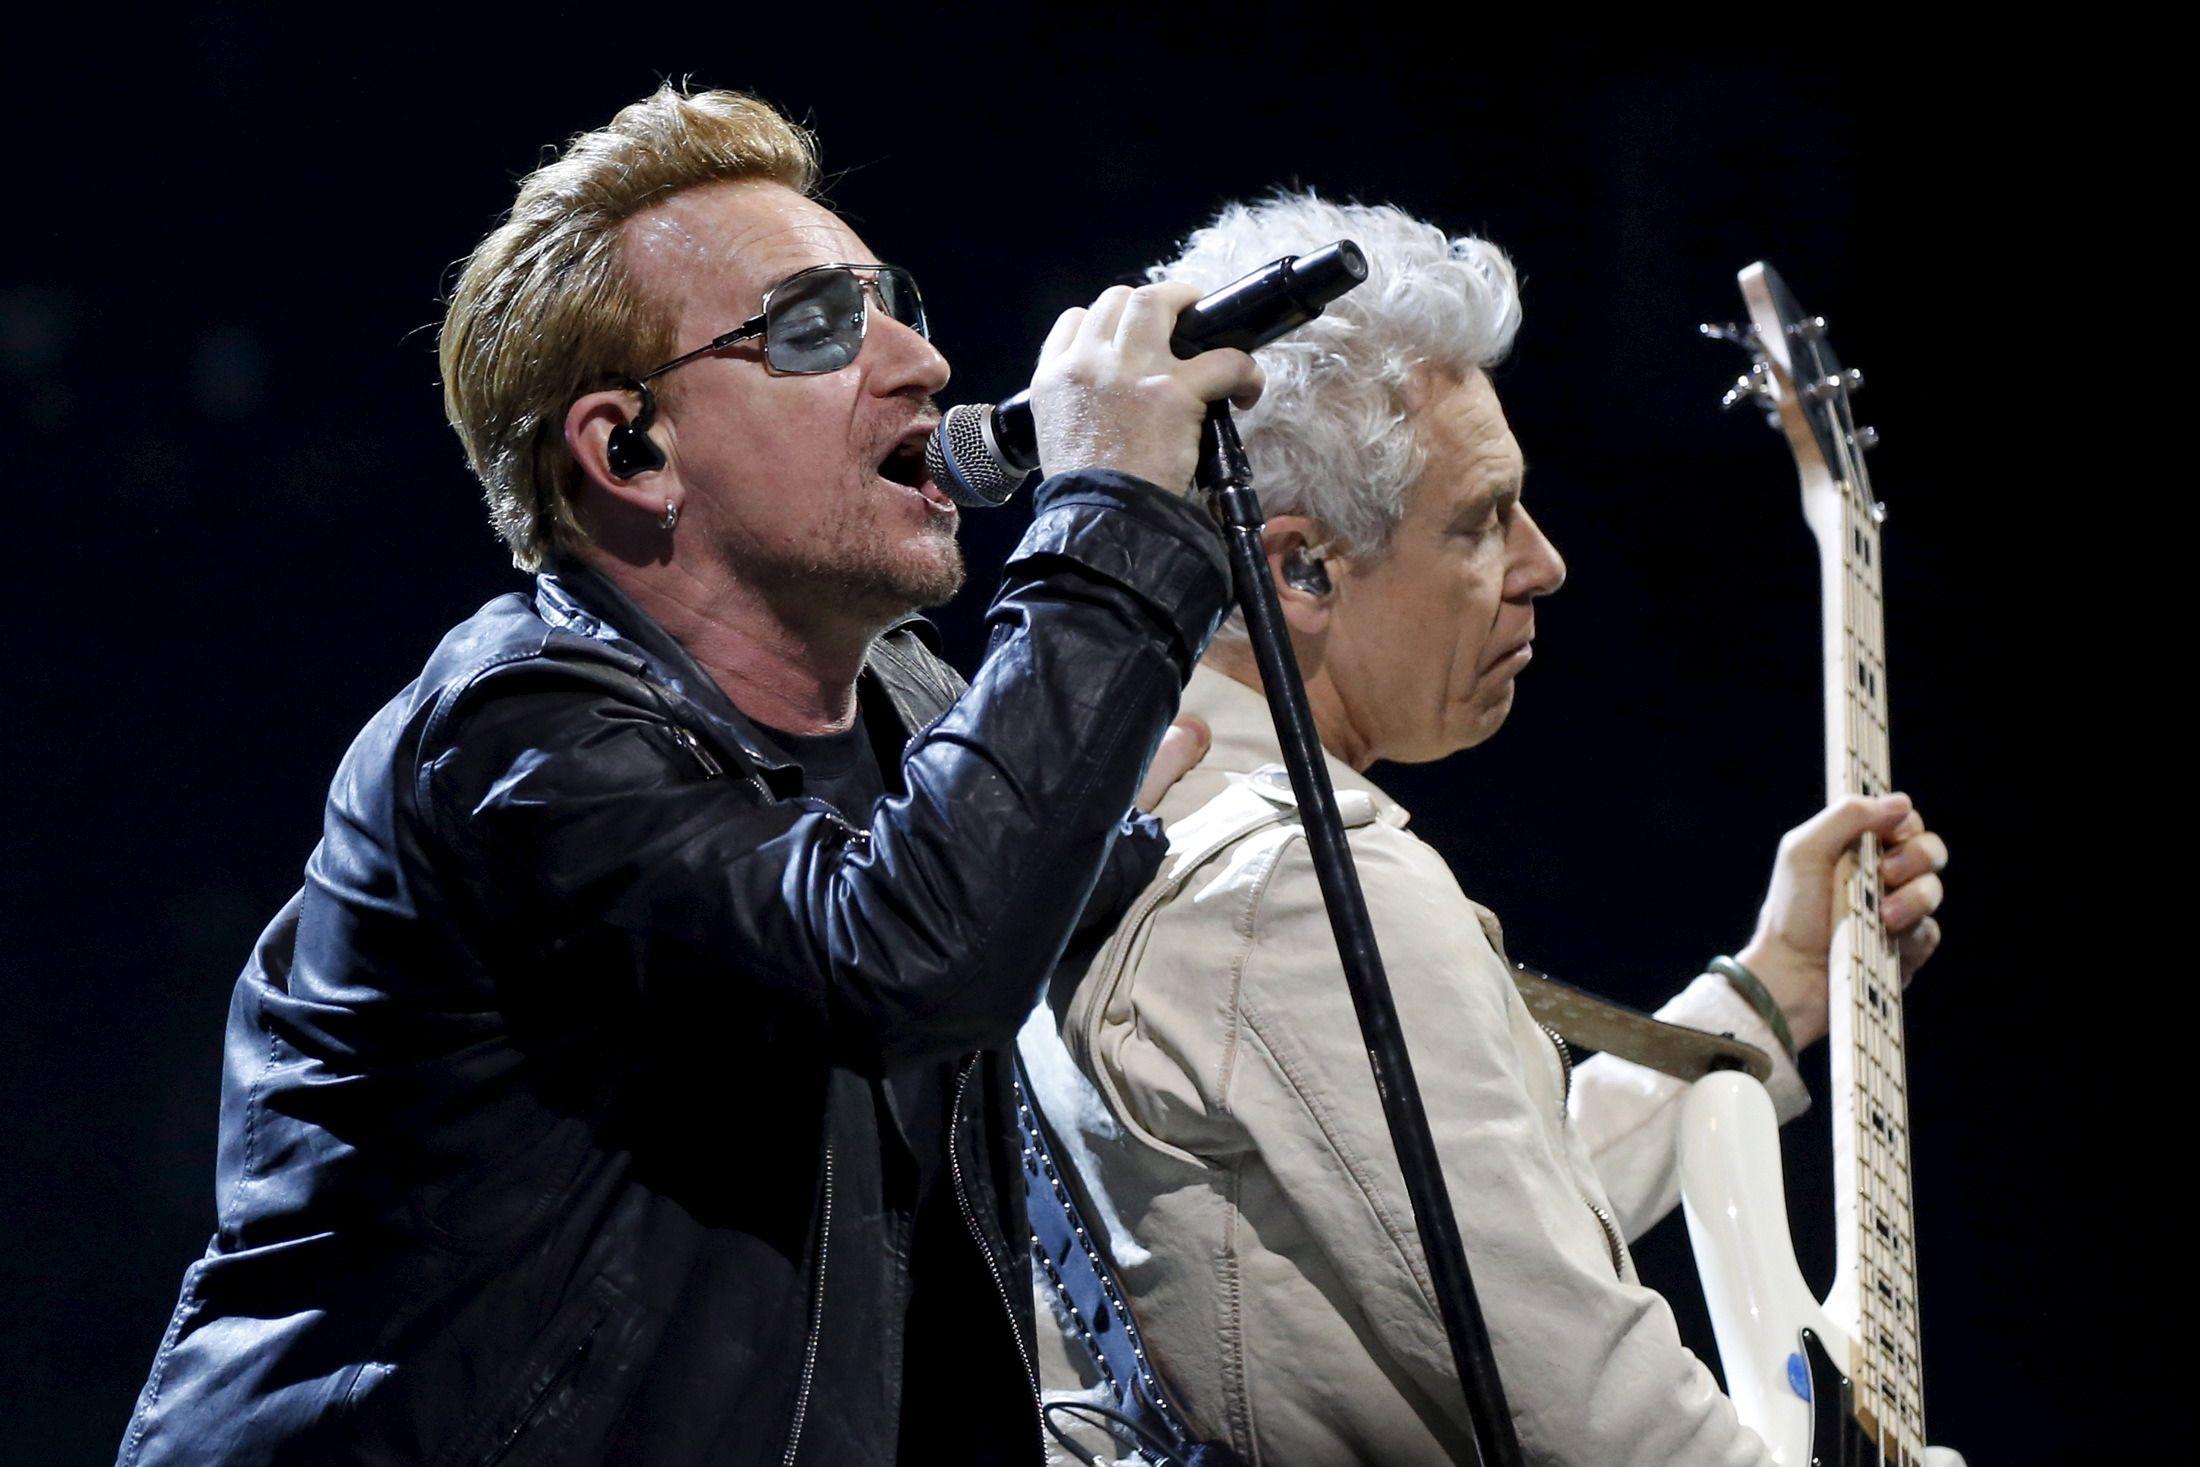 U2 play Paris concert and honor victims of attacks